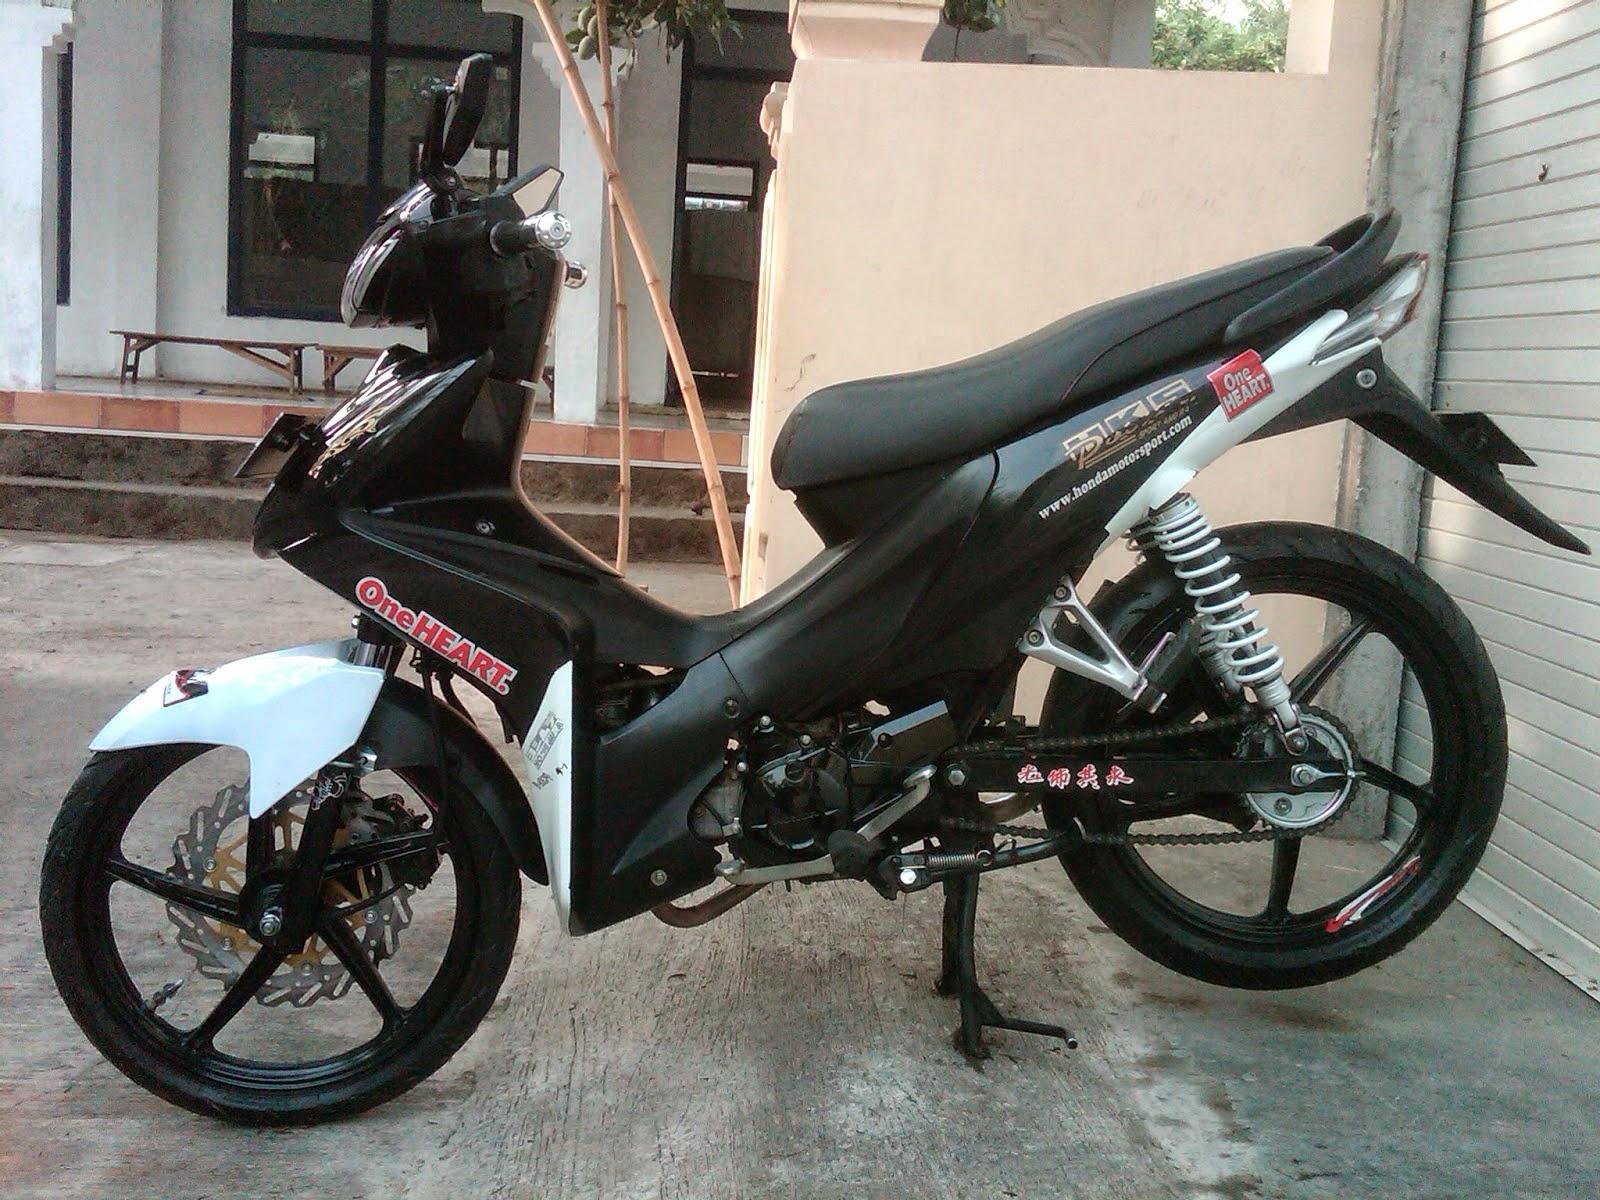 100 Modifikasi Motor Honda Absolut Revo Terbaru Kempoul Motor